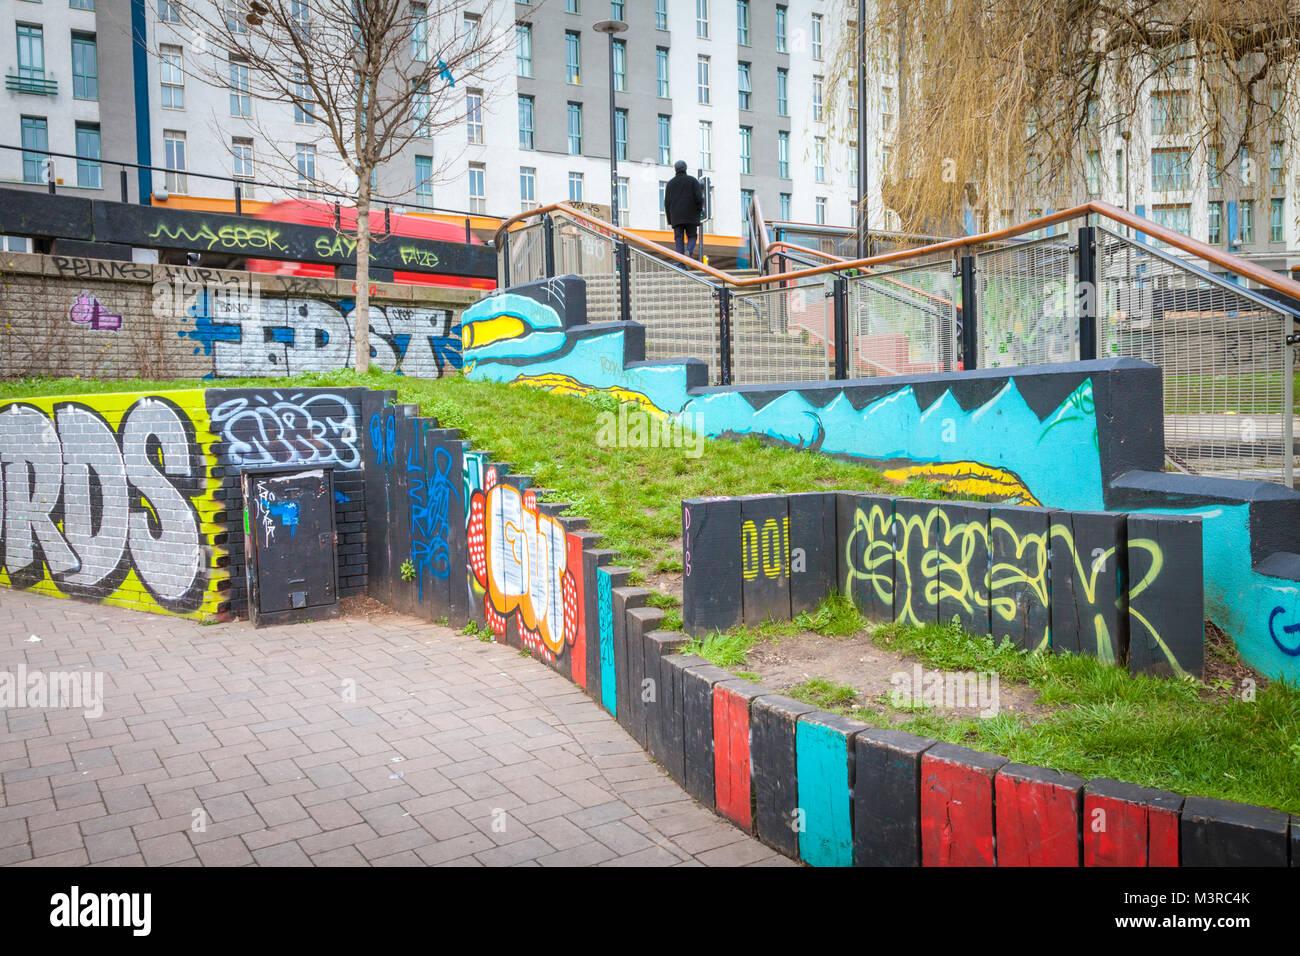 Painted and graffiti walls in Stokes croft bristol uk - Stock Image